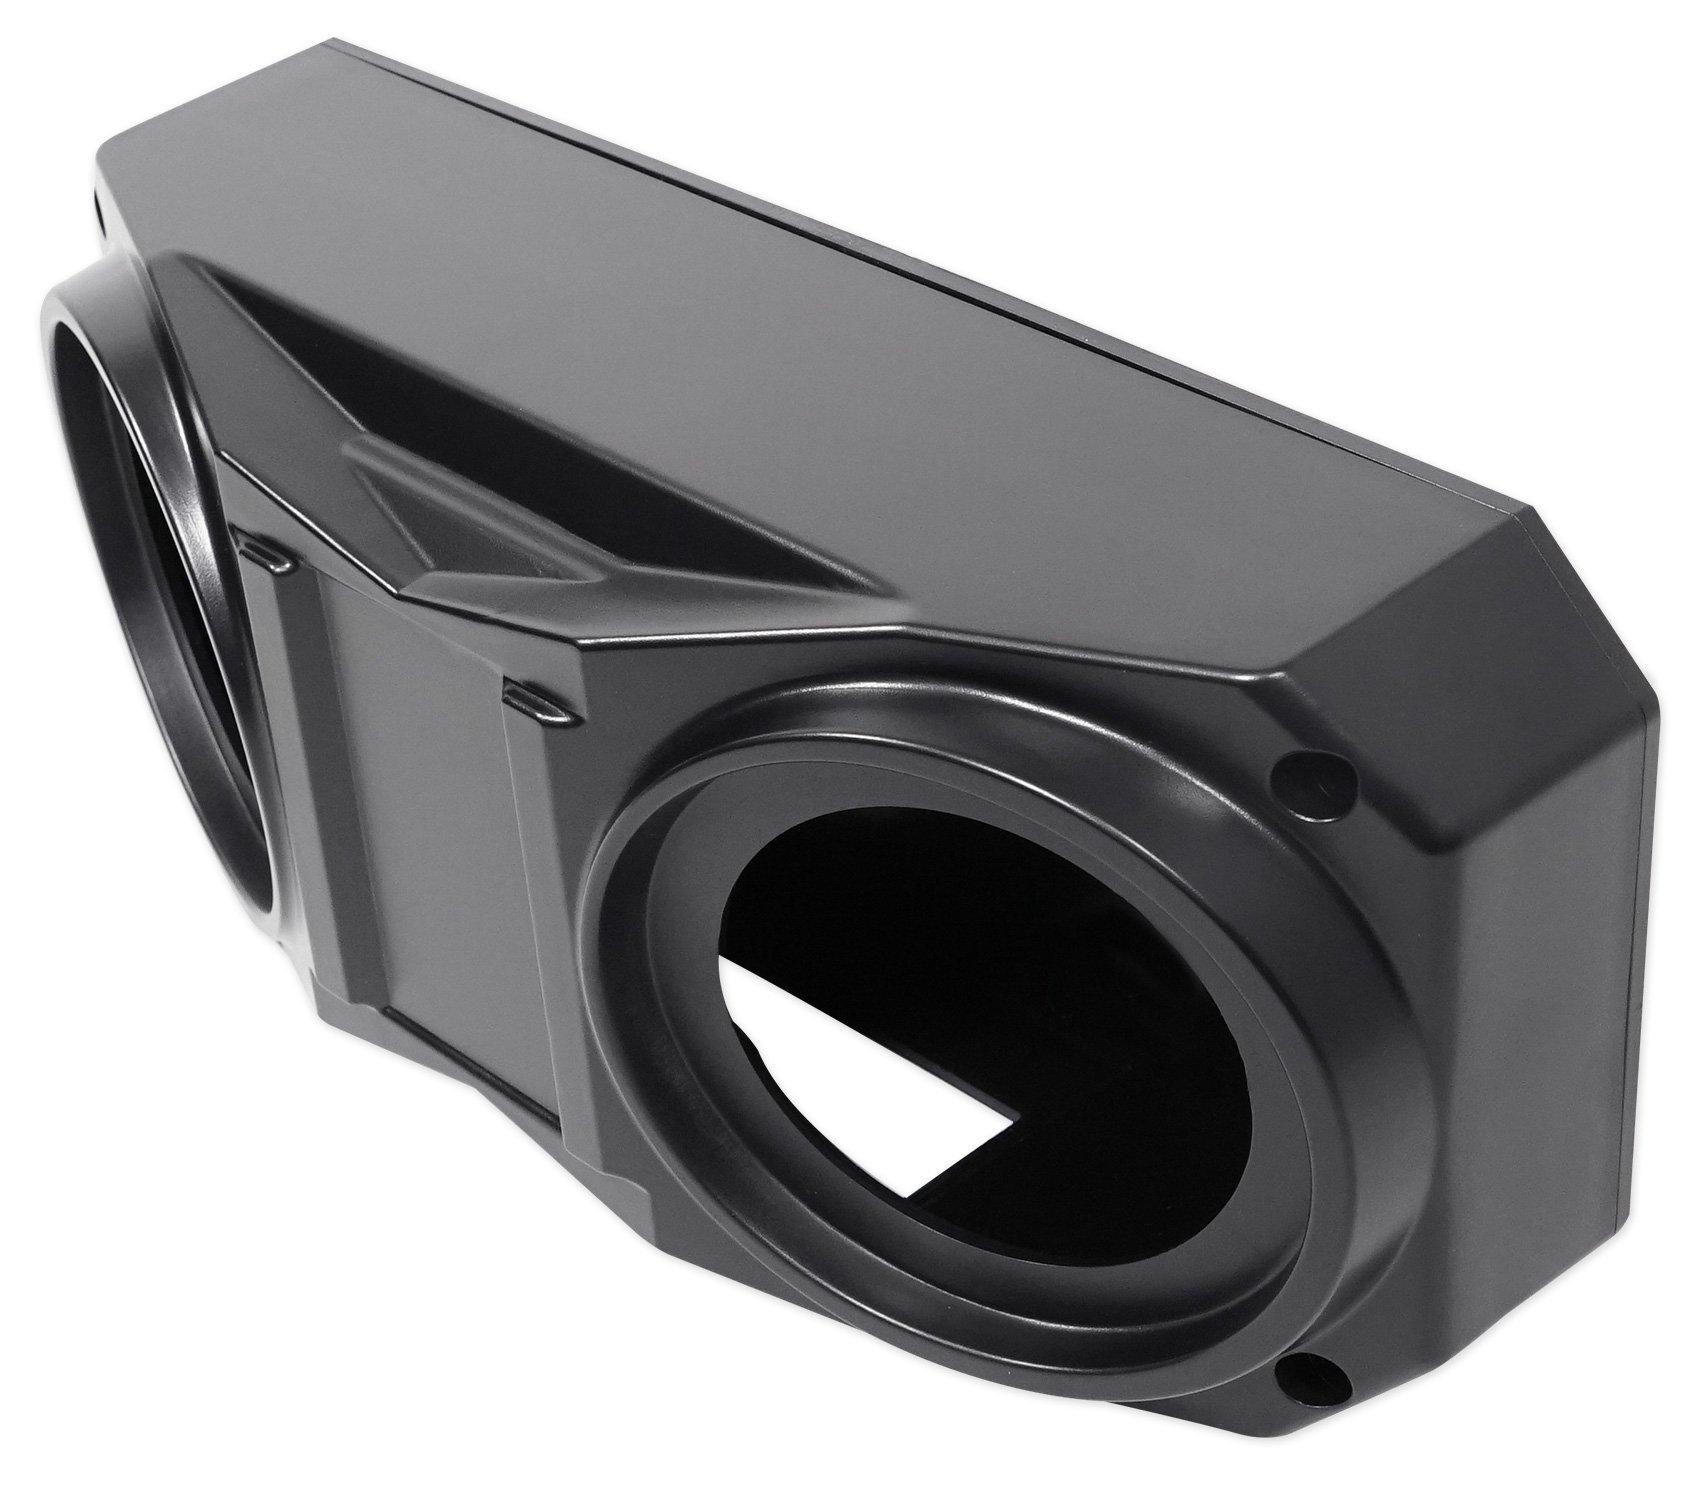 Metra OH-DIN01 6.5'' Overhead Speaker+Receiver Enclosure Polaris RZR/ATV/UTV/Cart by Metra (Image #4)